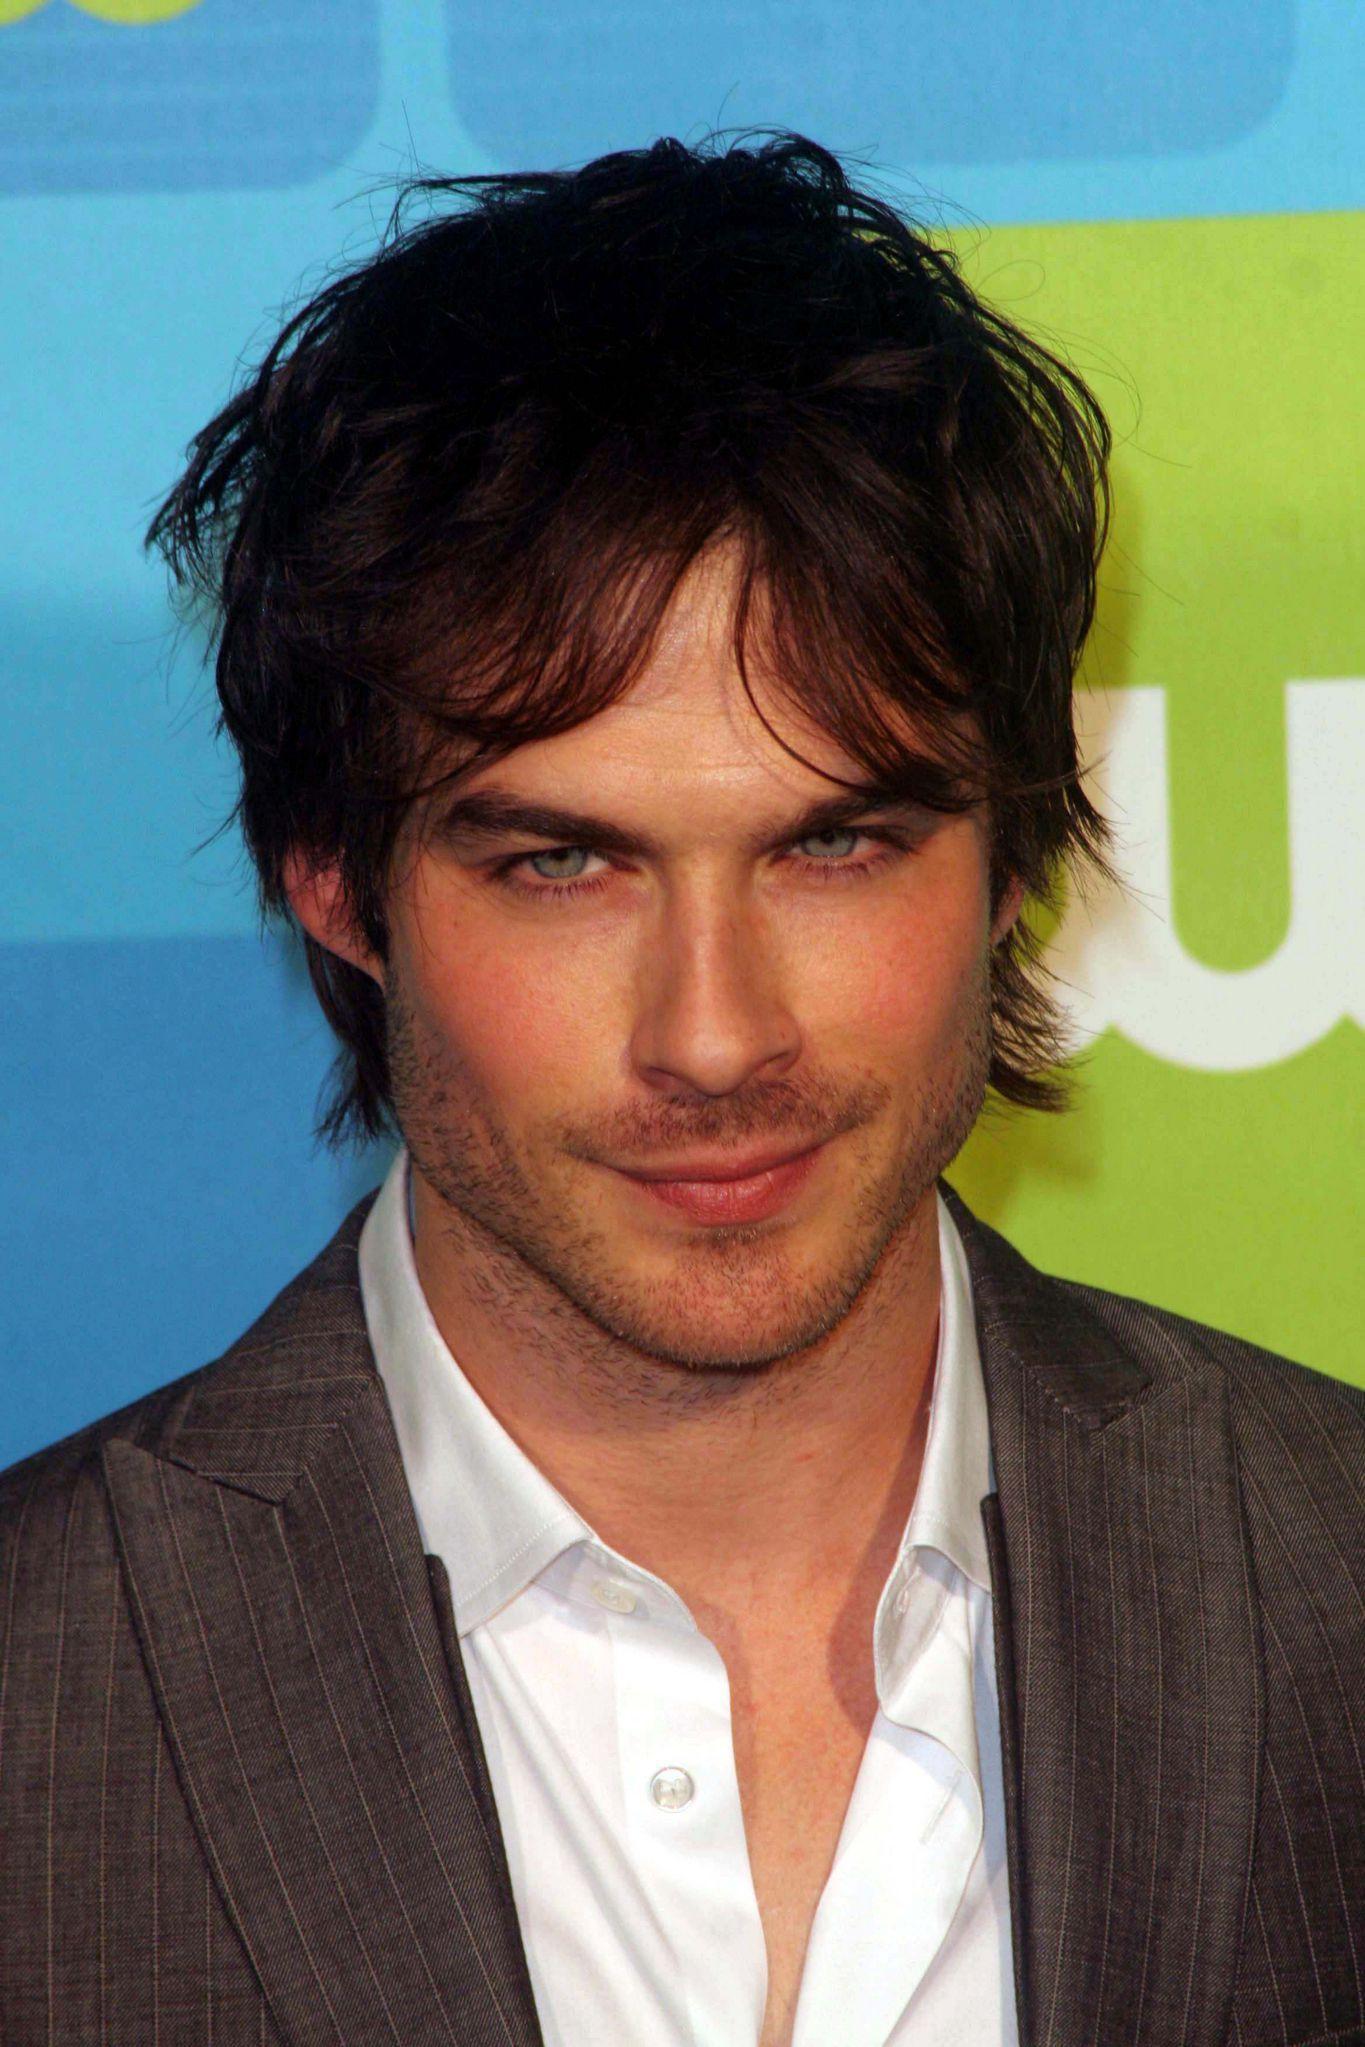 ian the perfect man